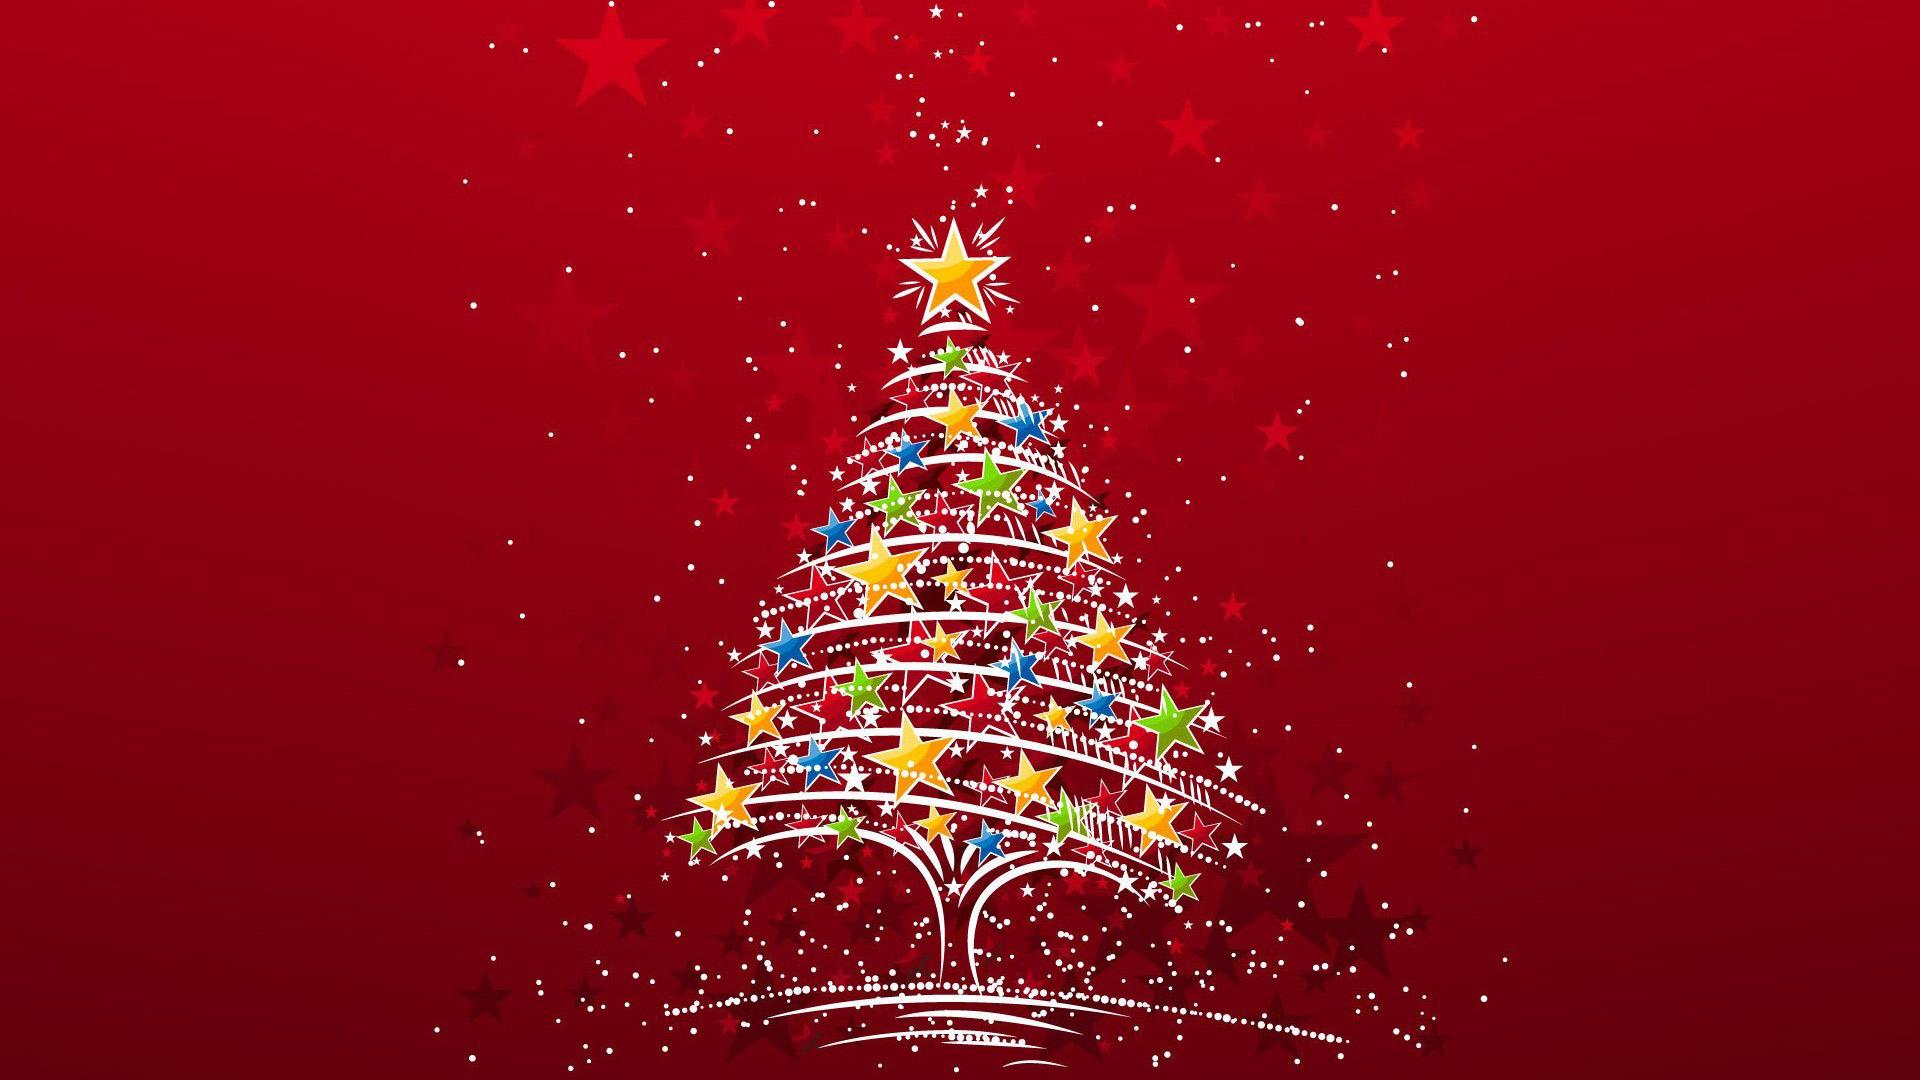 Christmas hd wallpaper 1080p 1920x1080 wallpapersafari for 1080p 1920x1080